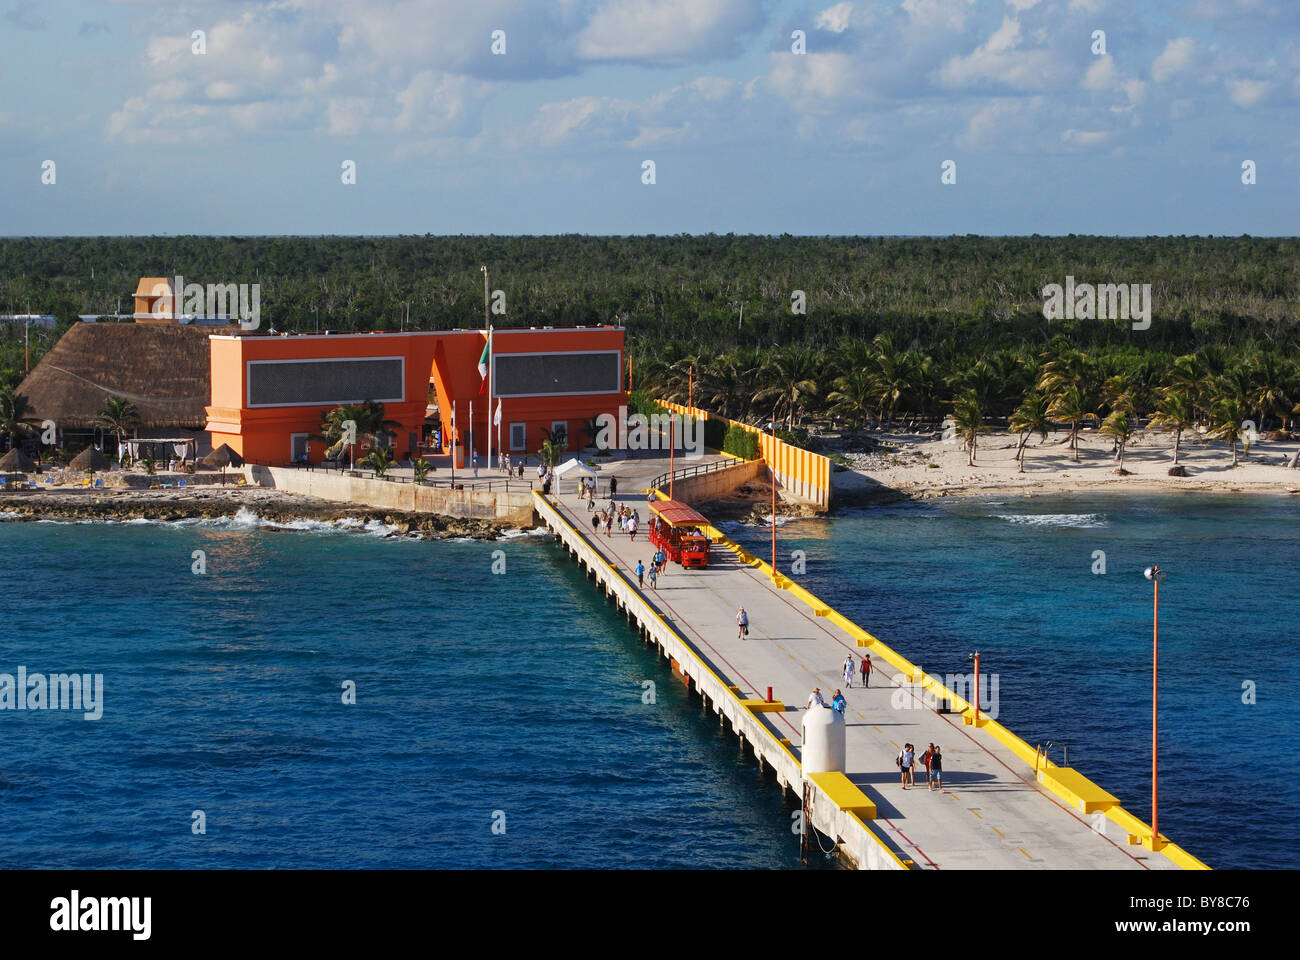 Jetty in the port area, Costa Maya, South Eastern Region, Mexico, Caribbean. Stock Photo